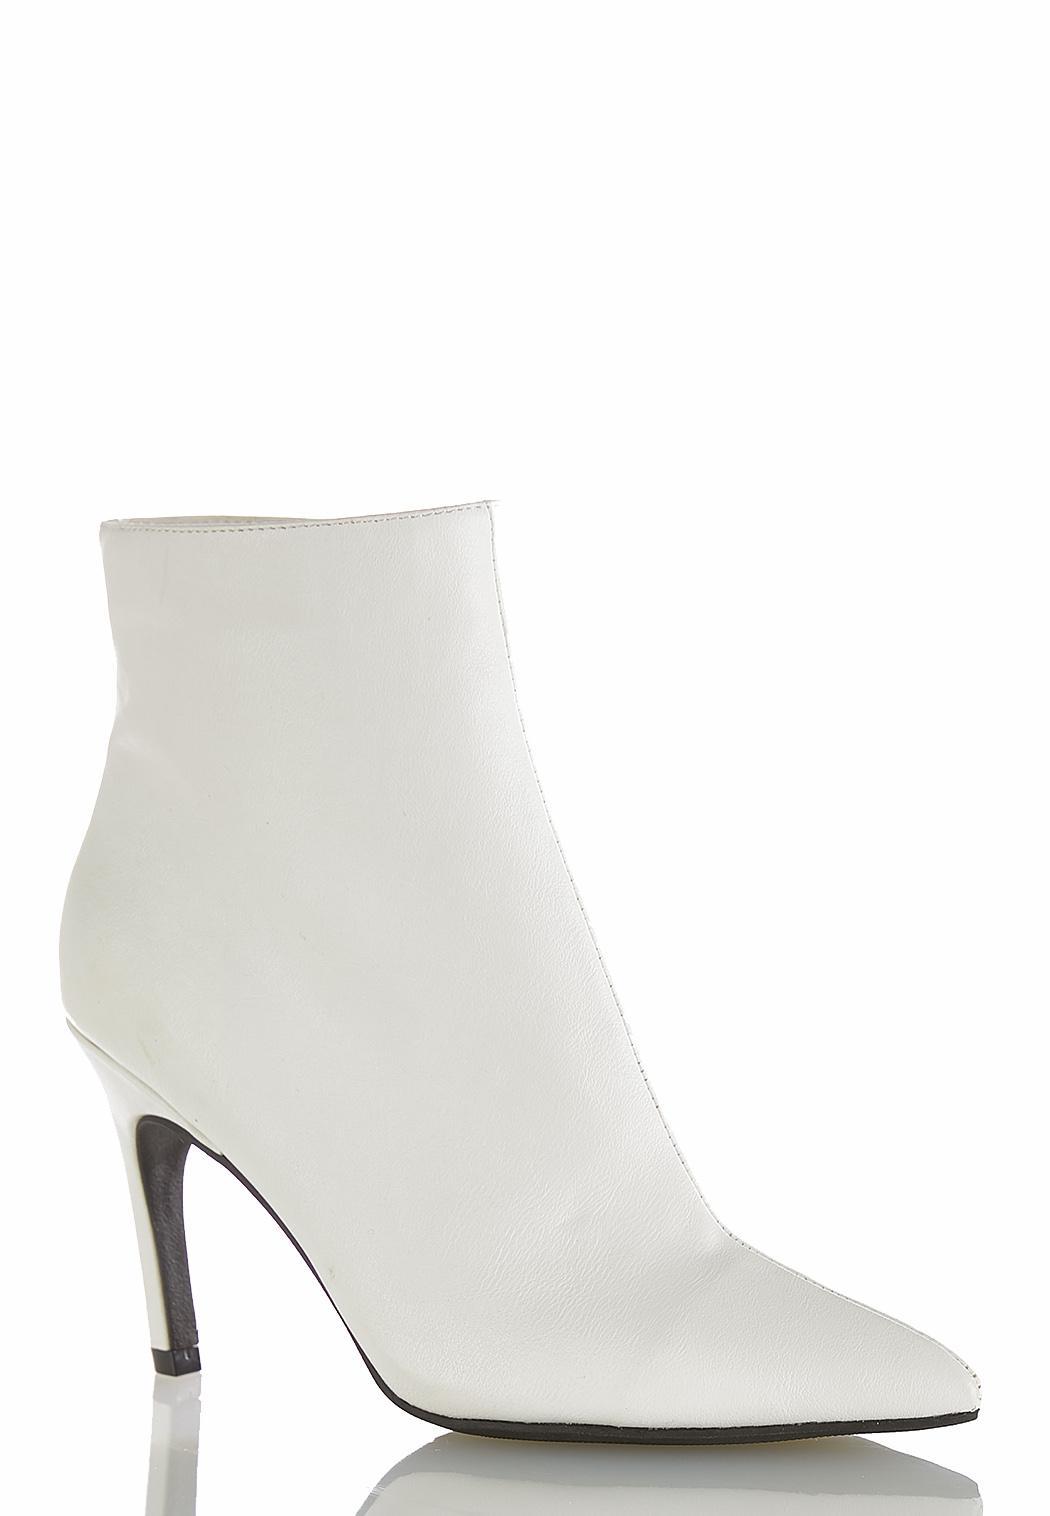 0caa54feef35 Women s Shoes - Boots